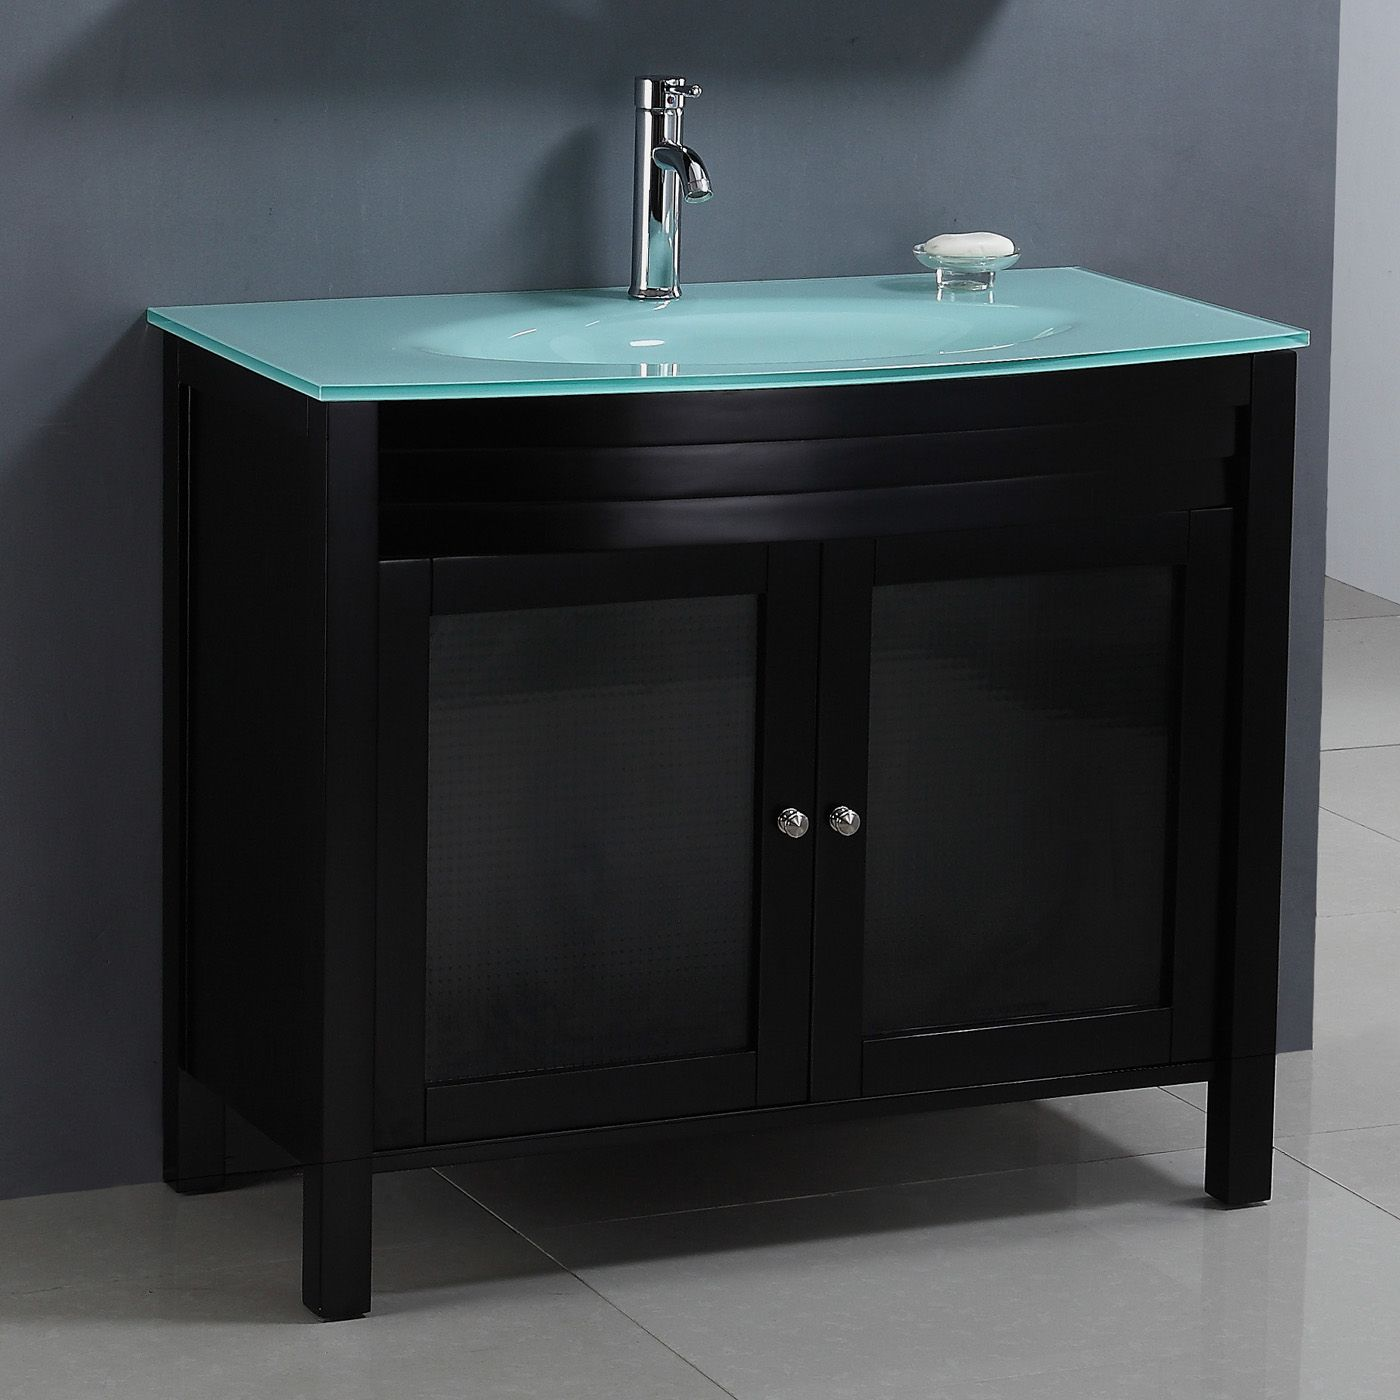 Attirant Legion Furniture WA2140 Modern 39 In Single Sink Chest Bathroom Vanity